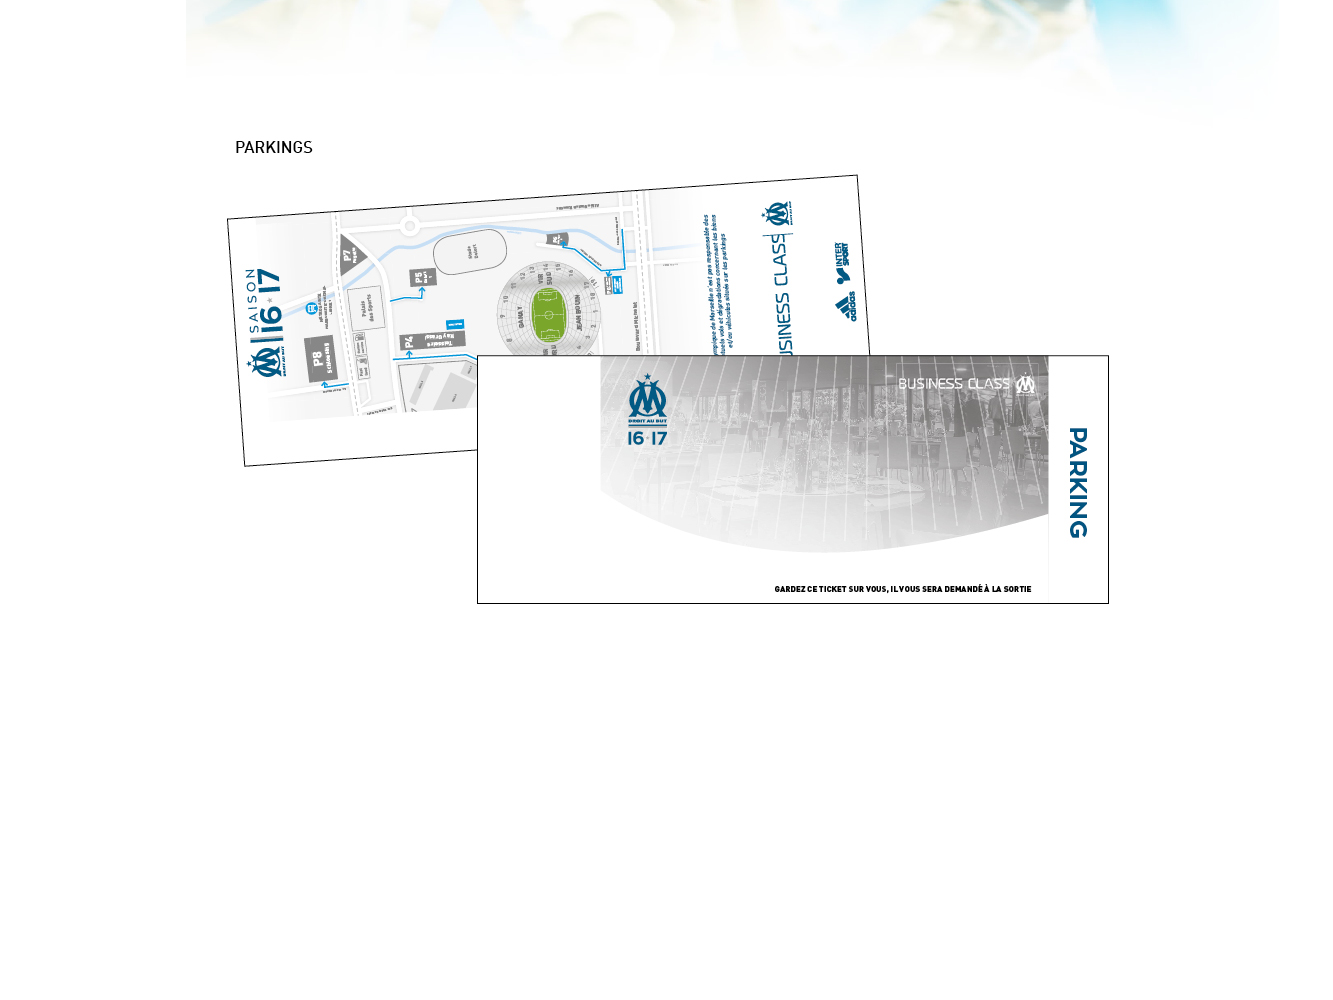 carton acces parking OM business class